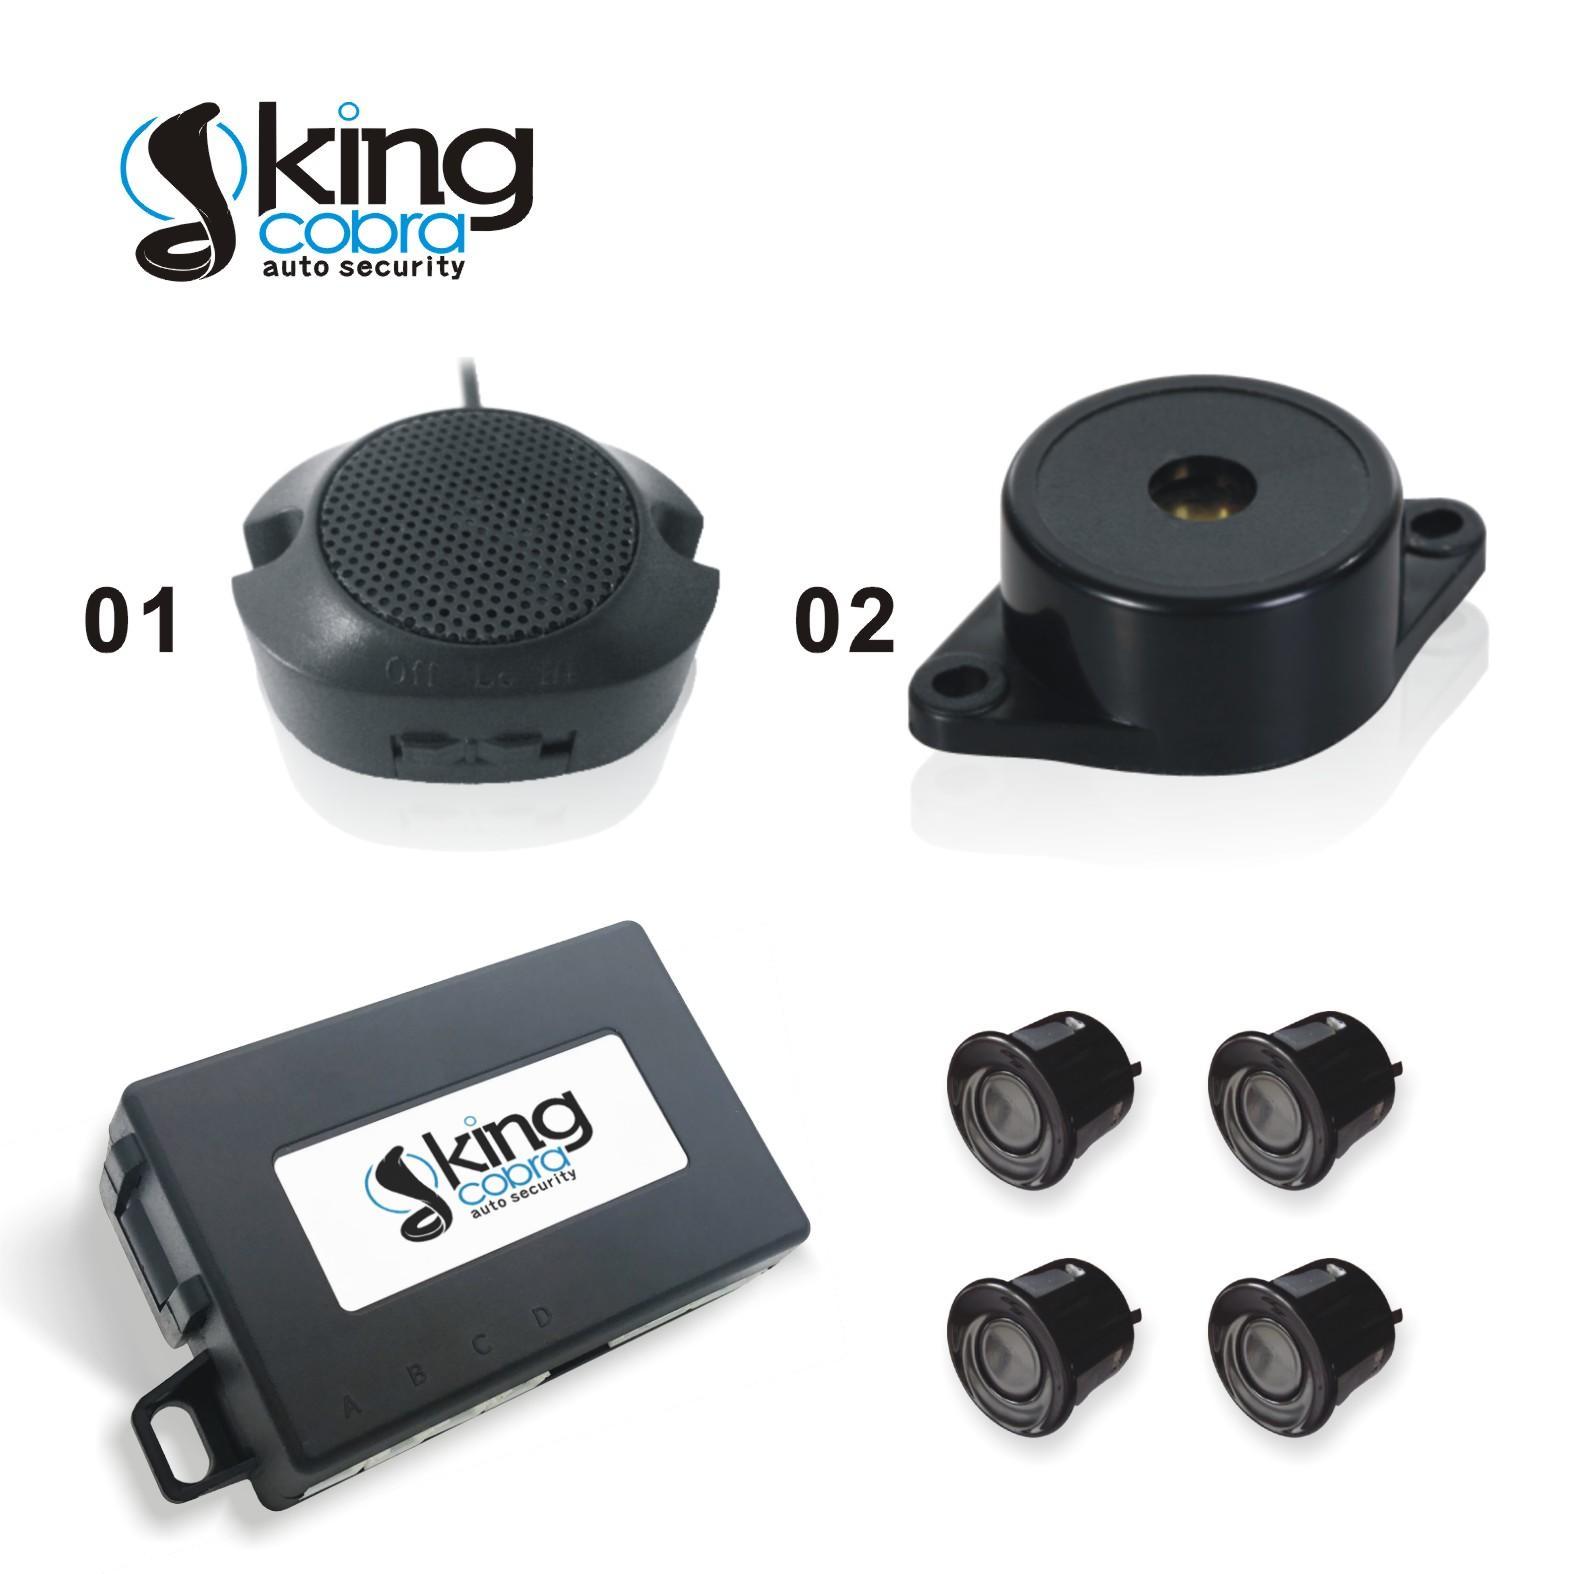 car parking sensor price online Kingcobra-2